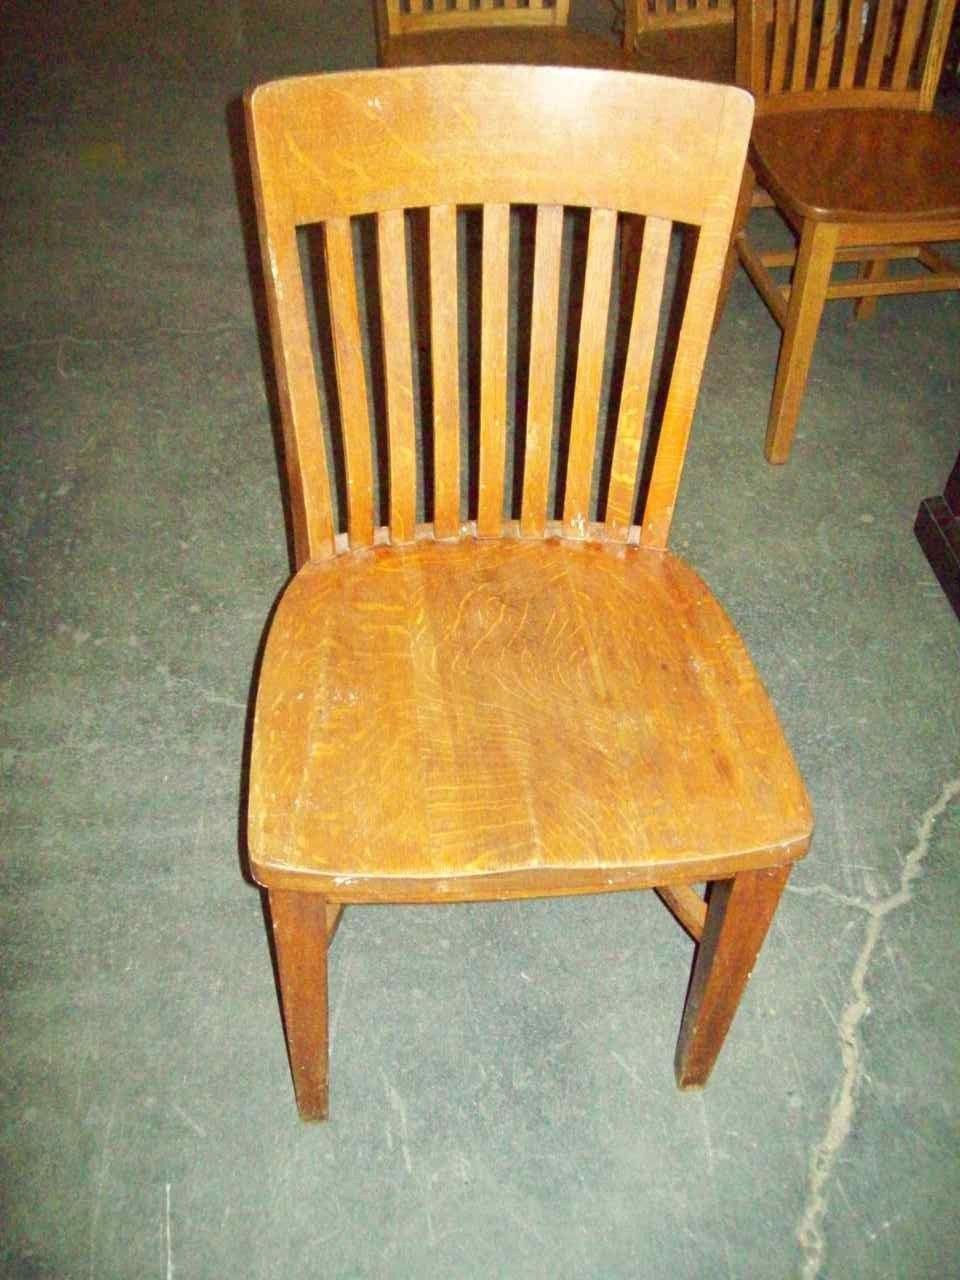 Tiger oak dining chair 19191 | 제품, 식탁 의자 및 호랑이